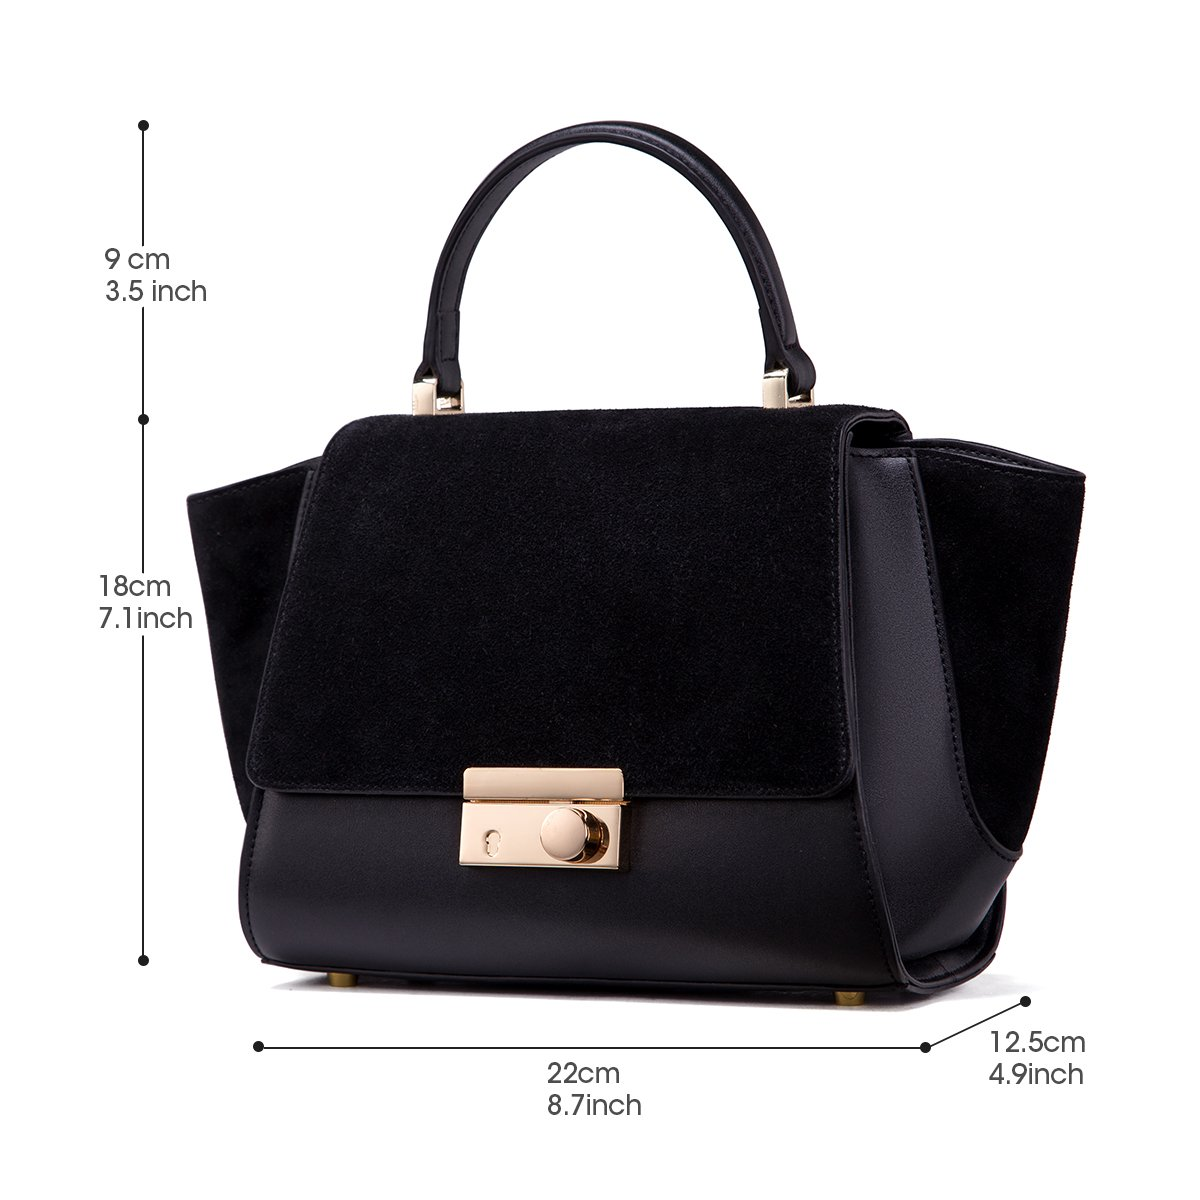 92b4e038bba5 Ladies Black Leather Handbags Designer Purses with Adjustable Shoulder  Strap  Handbags  Amazon.com